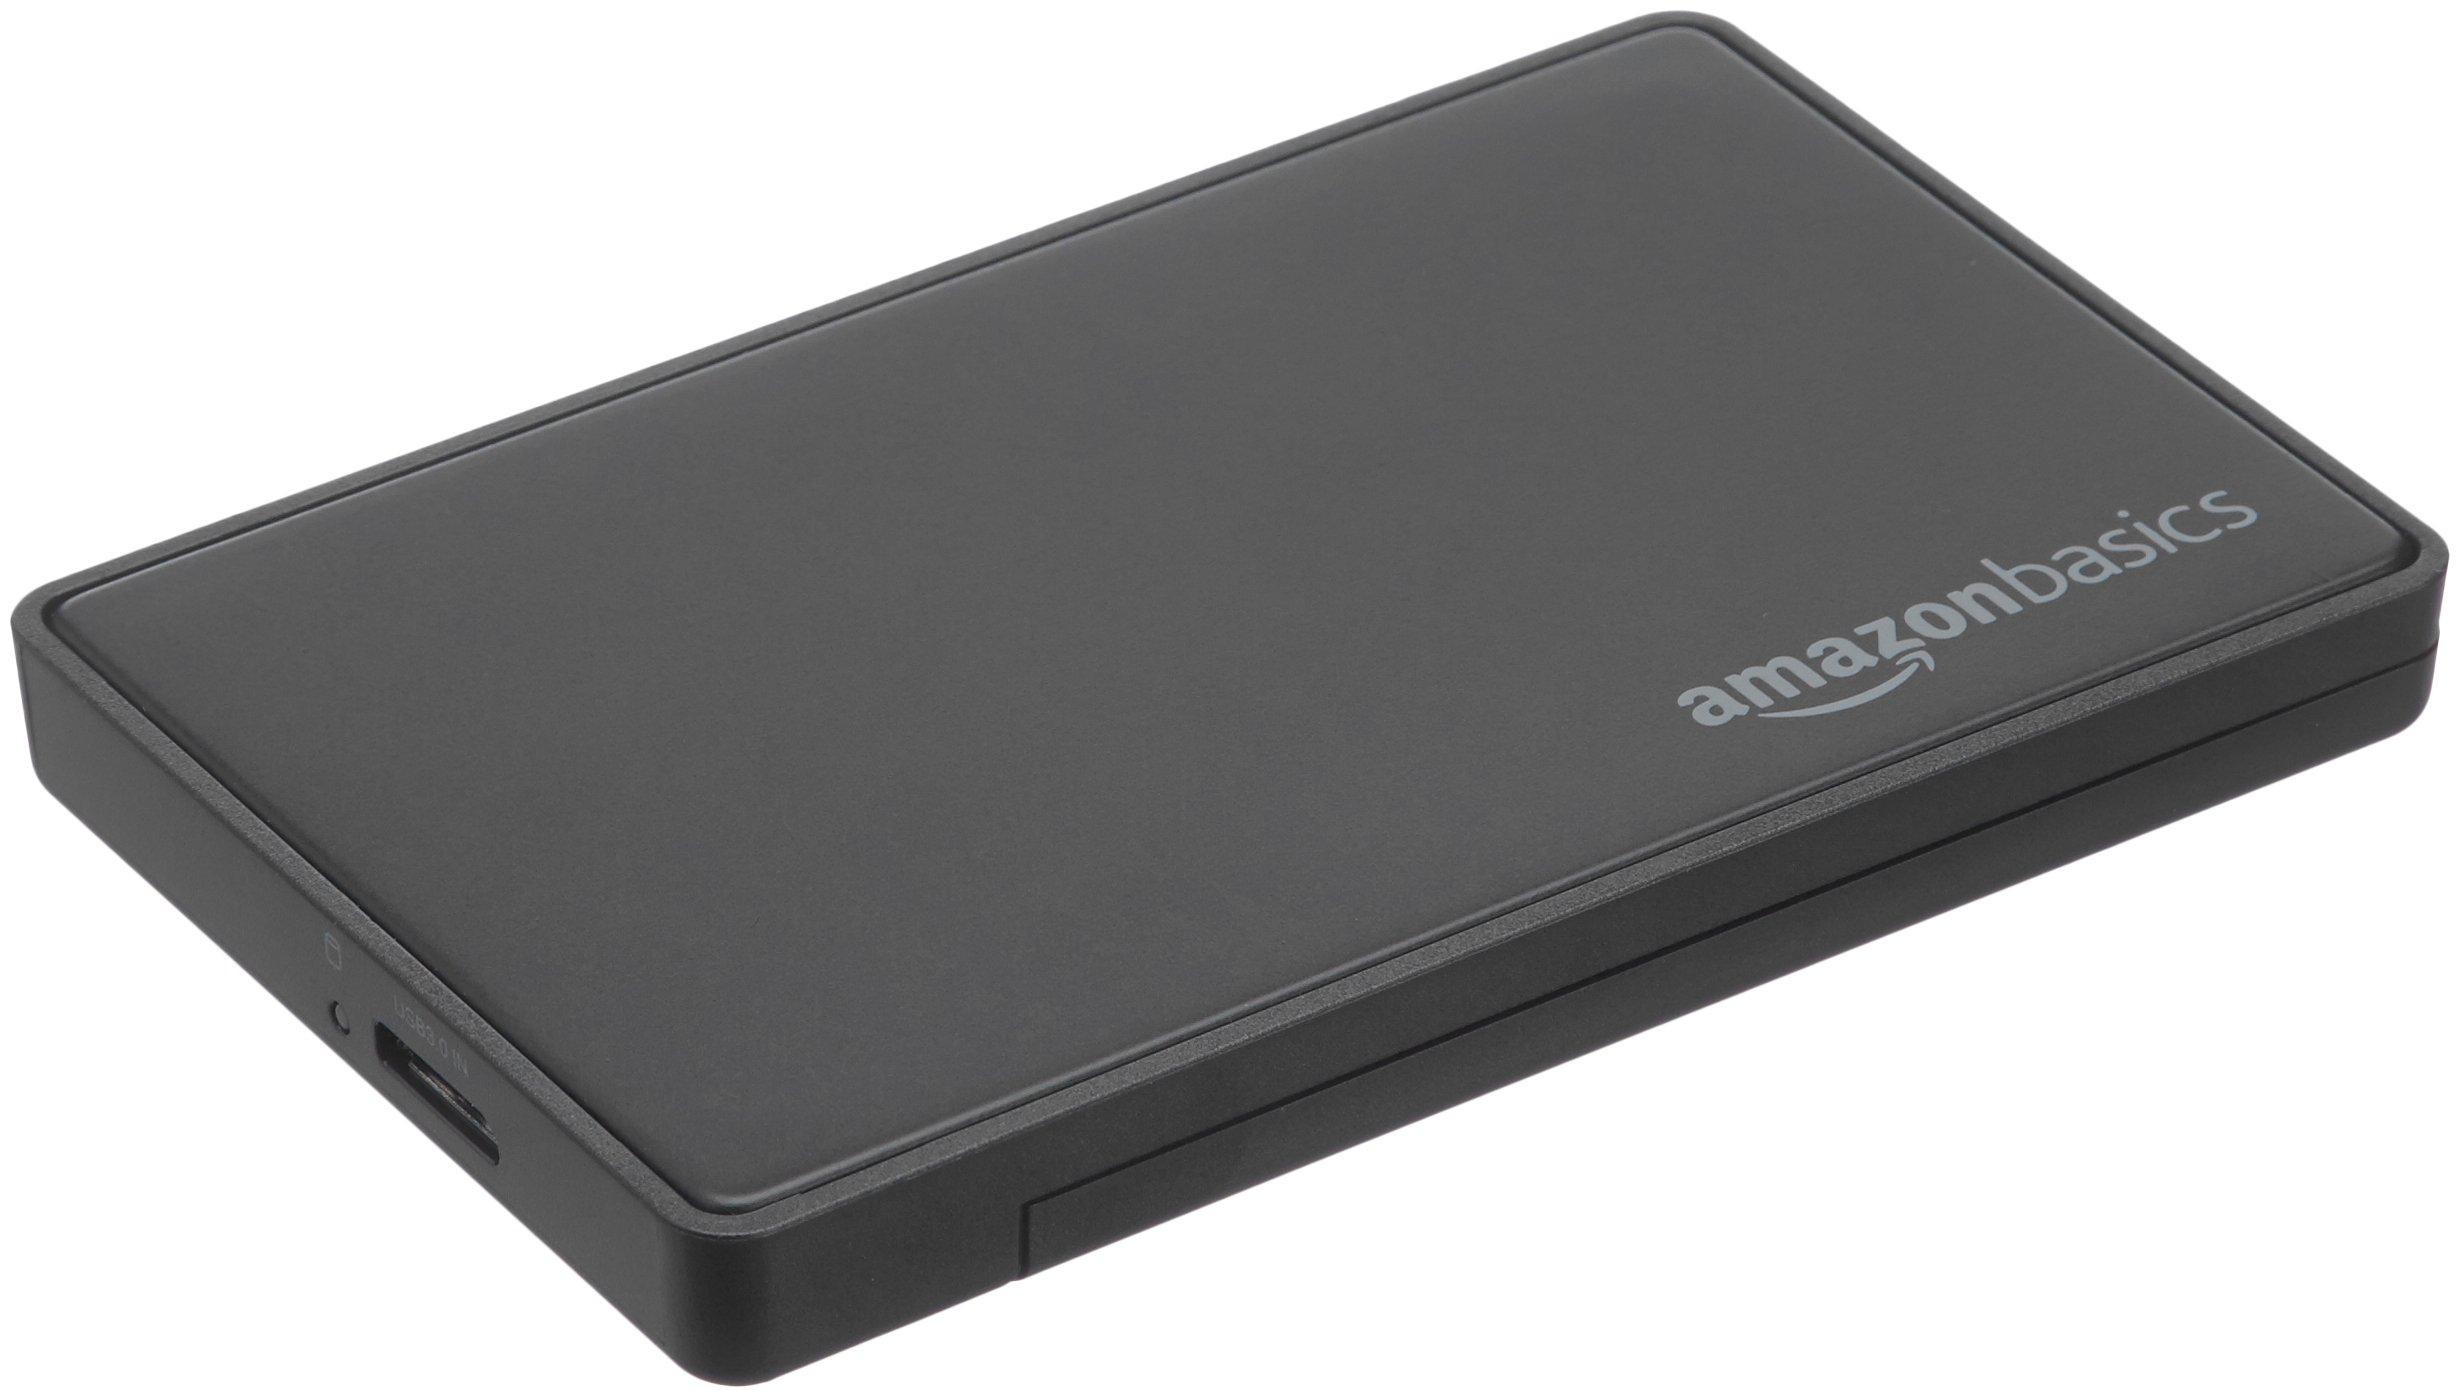 AmazonBasics 2.5-inches SATA Hard Drive Enclosure - USB 3.0